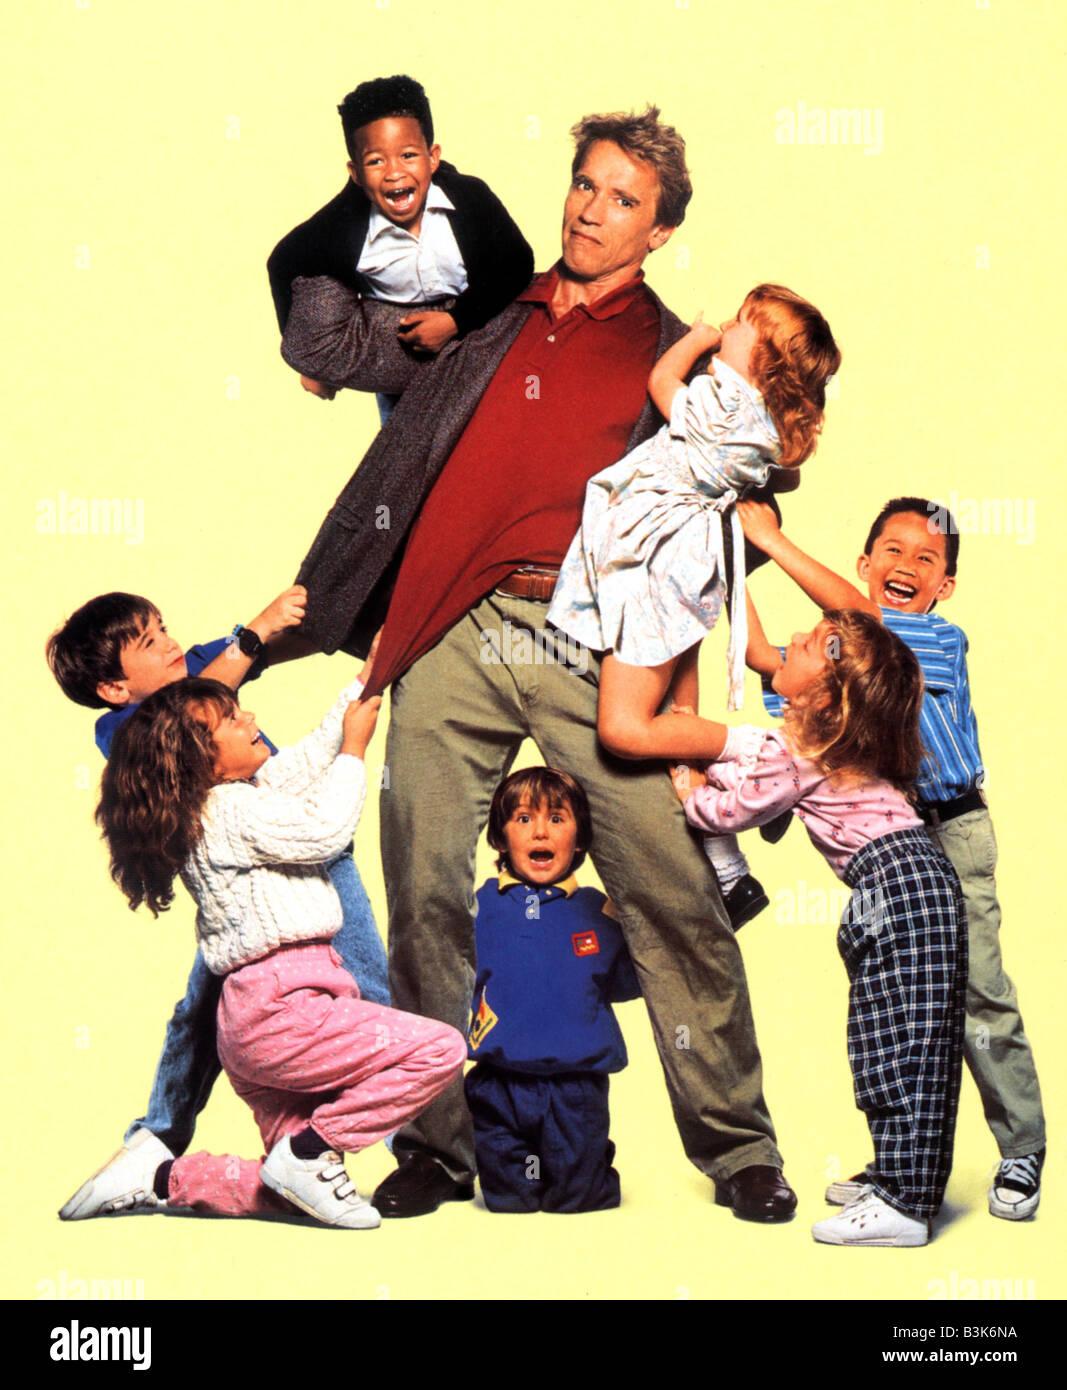 Kindergarten Cop 1990 Universal Film With Arnold Schwarzenegger Stock Photo Alamy